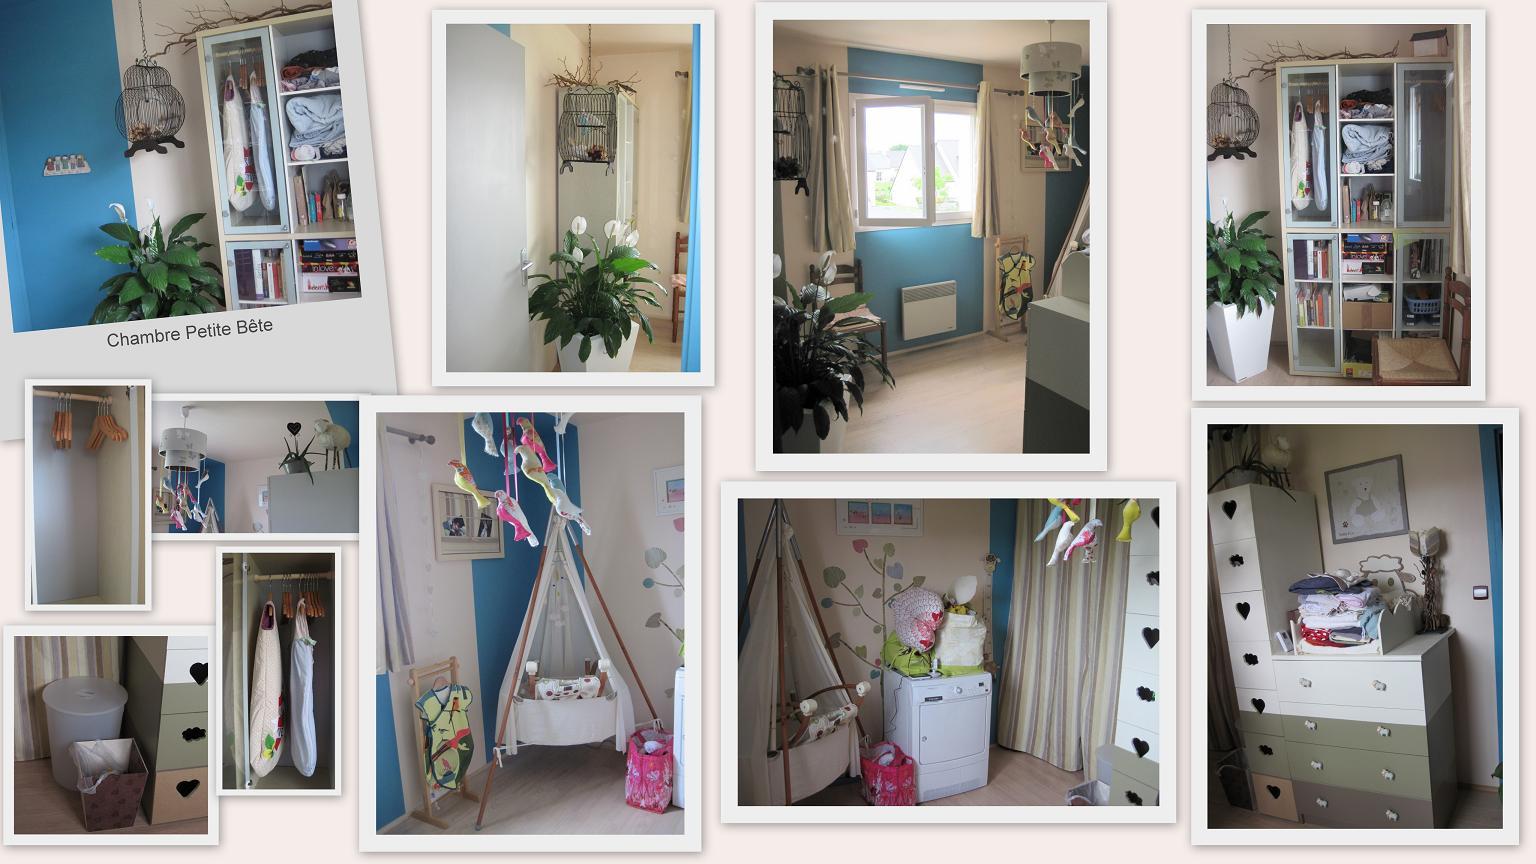 ikea chambre bebe bois chambre presque finie les crations de marie - Chambre Bebe Ikea